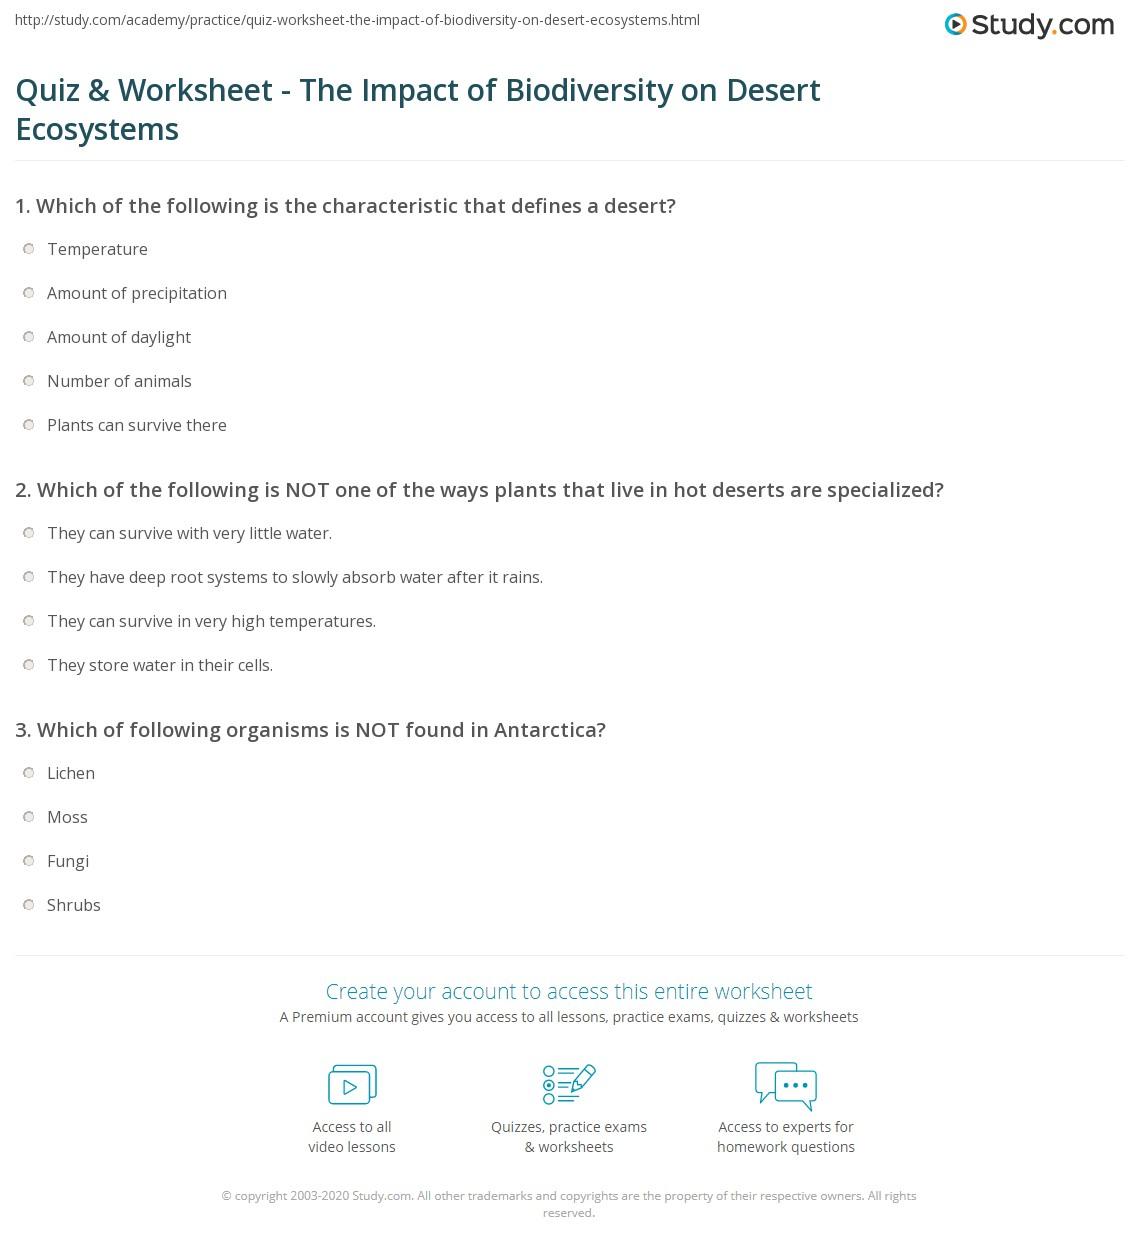 Quiz & Worksheet - The Impact of Biodiversity on Desert Ecosystems ...